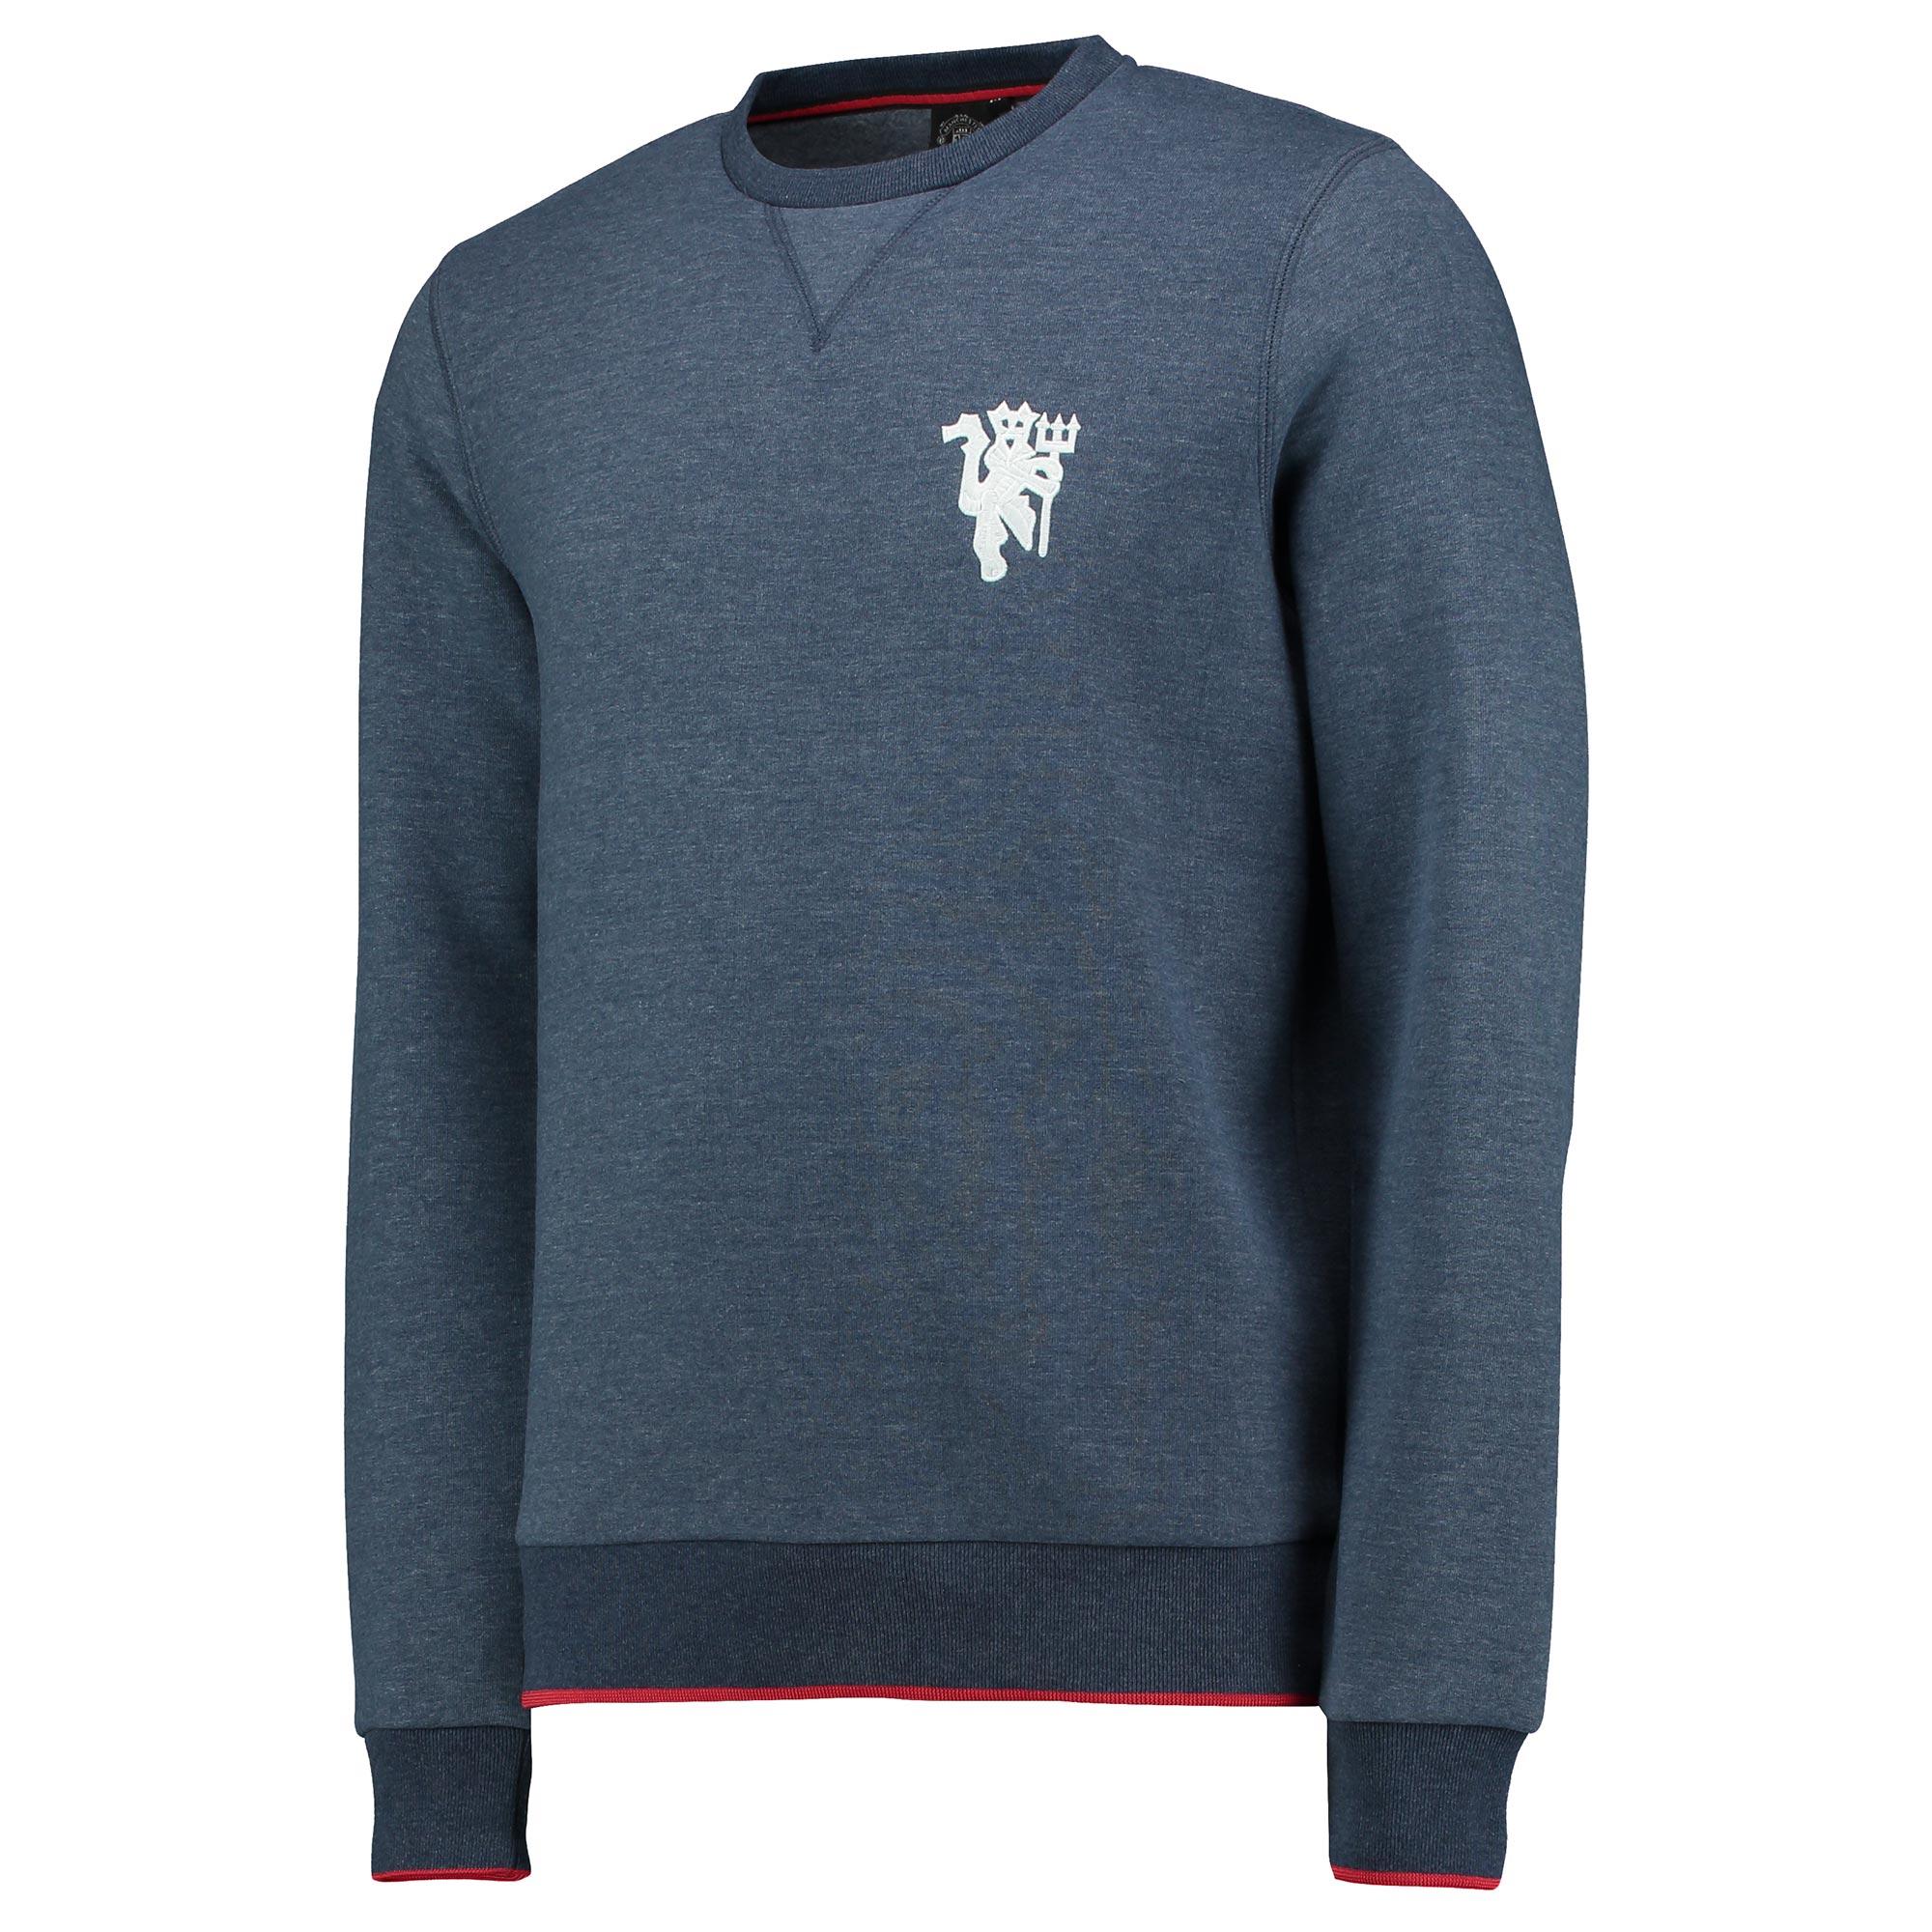 Manchester United Lifestyle Crew Neck Sweater - Denim - Mens